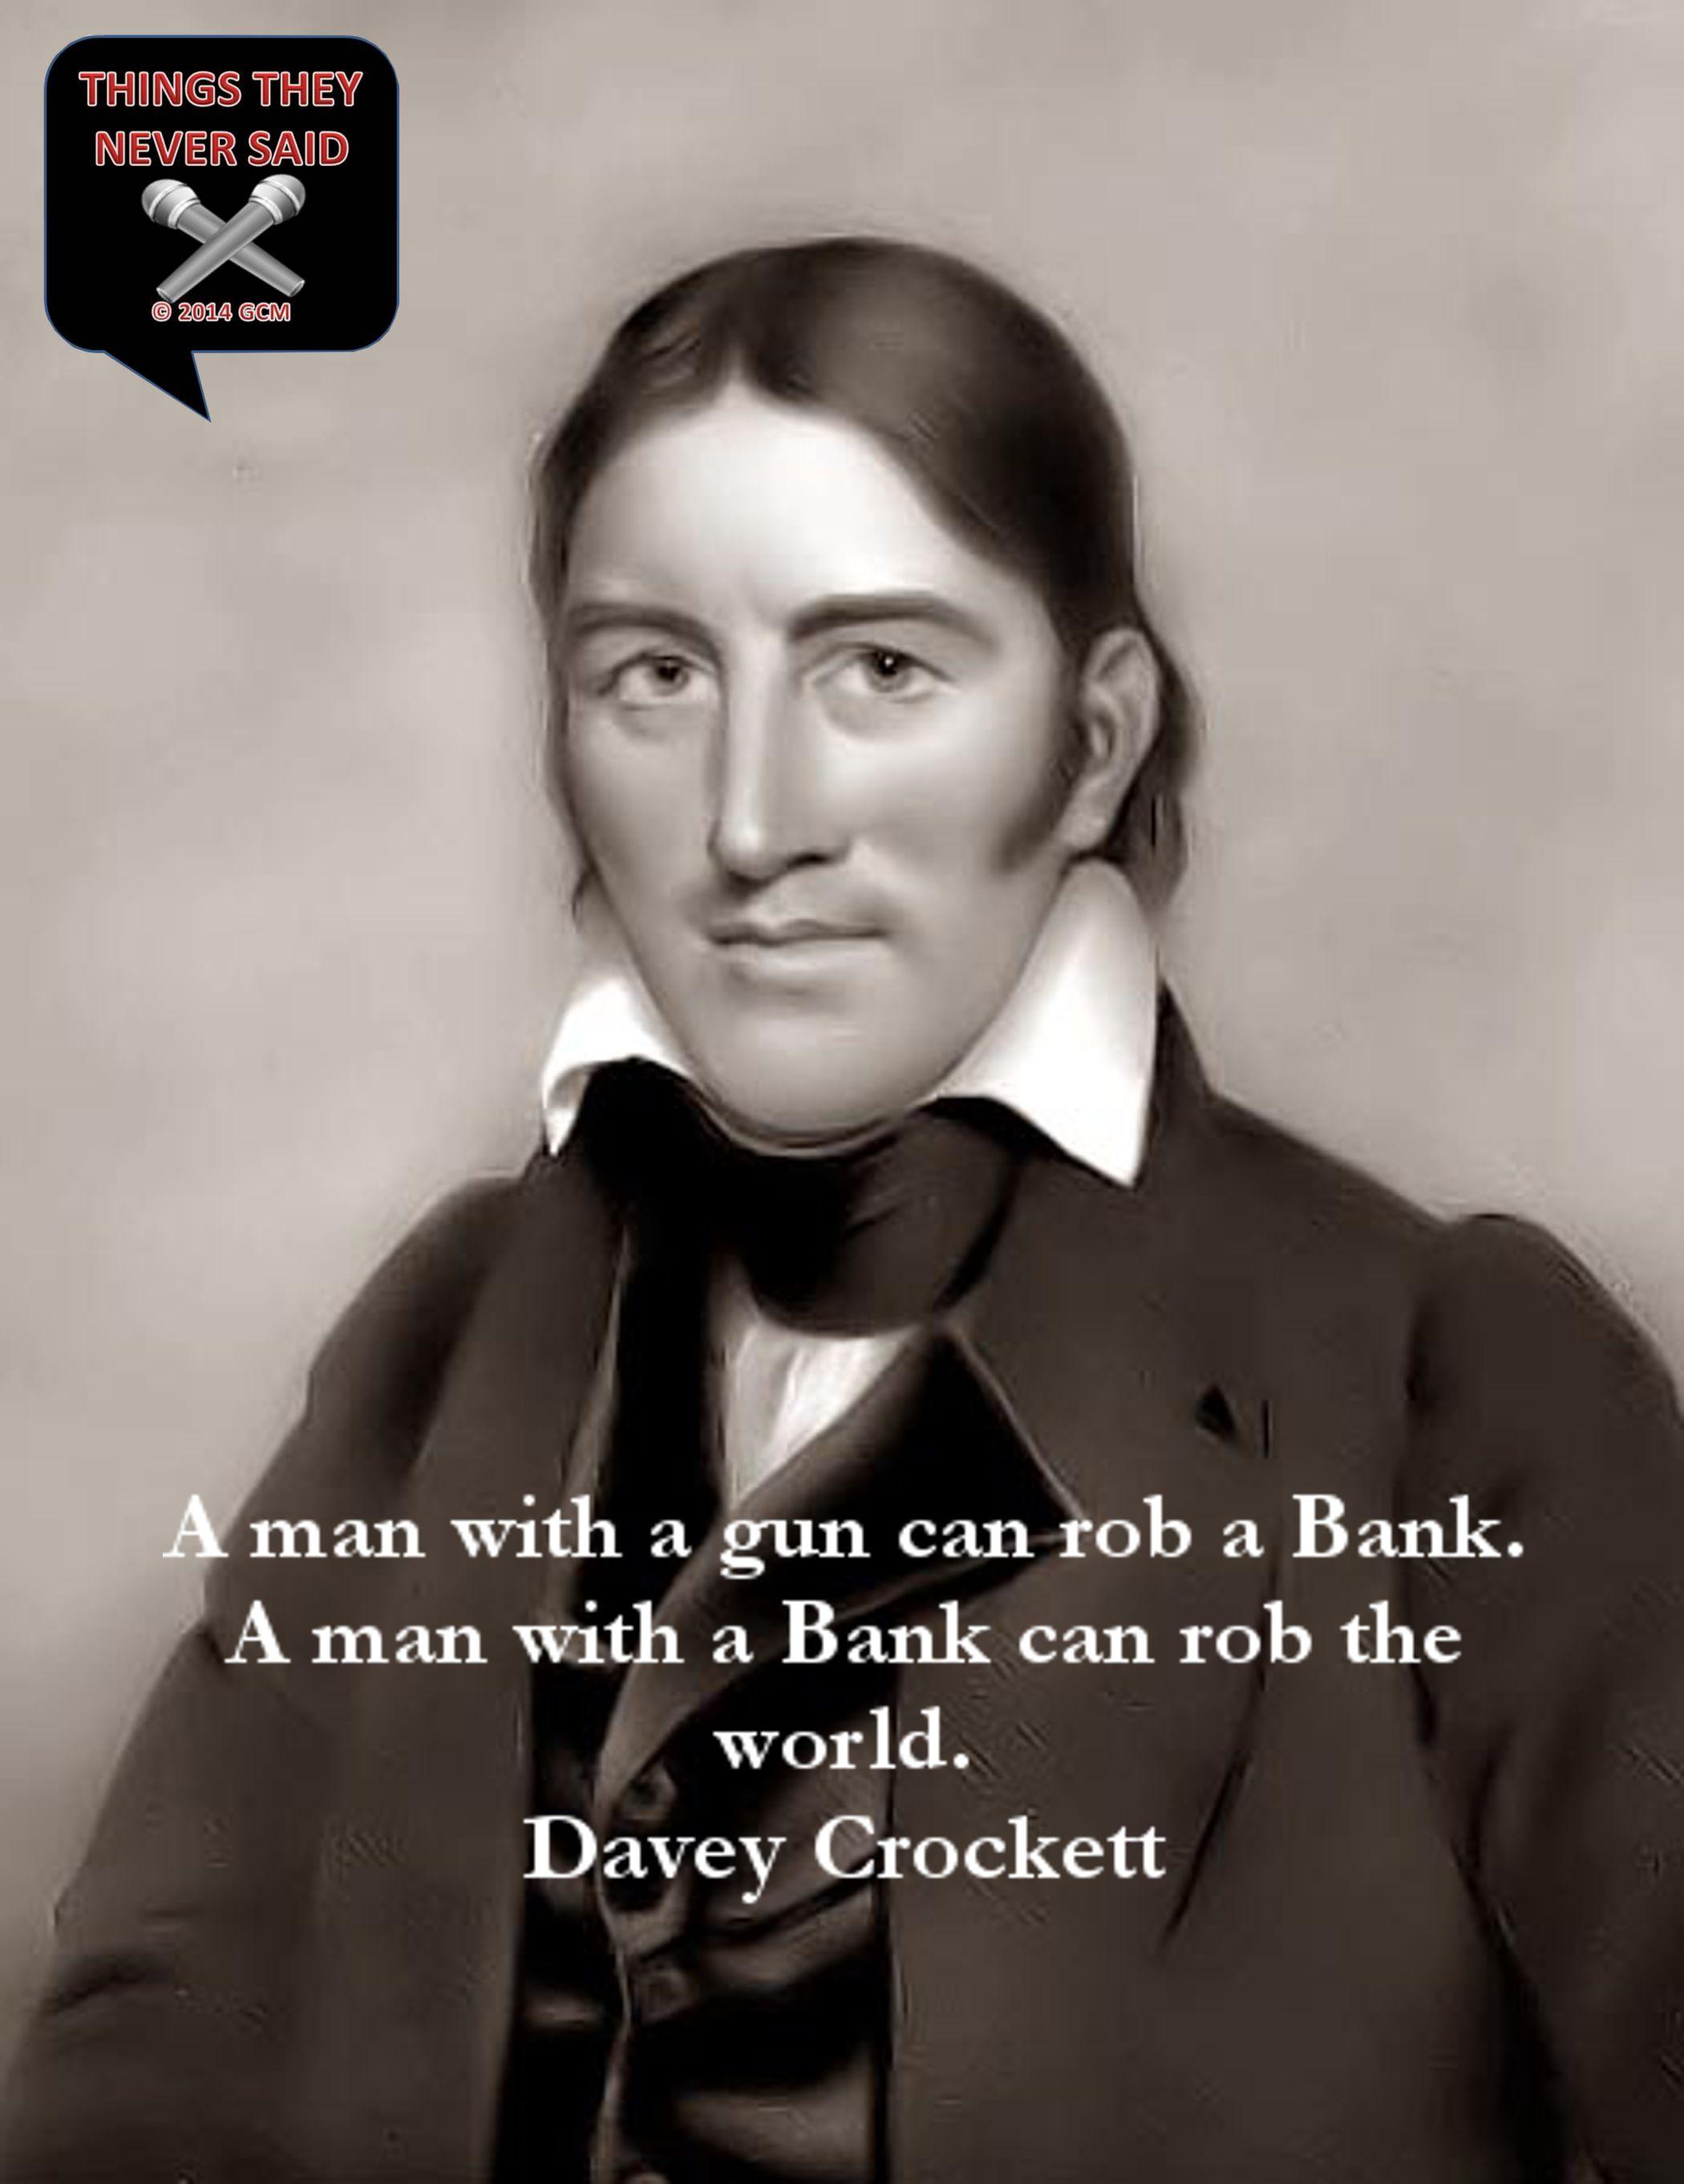 Davey Crockett Never Said This